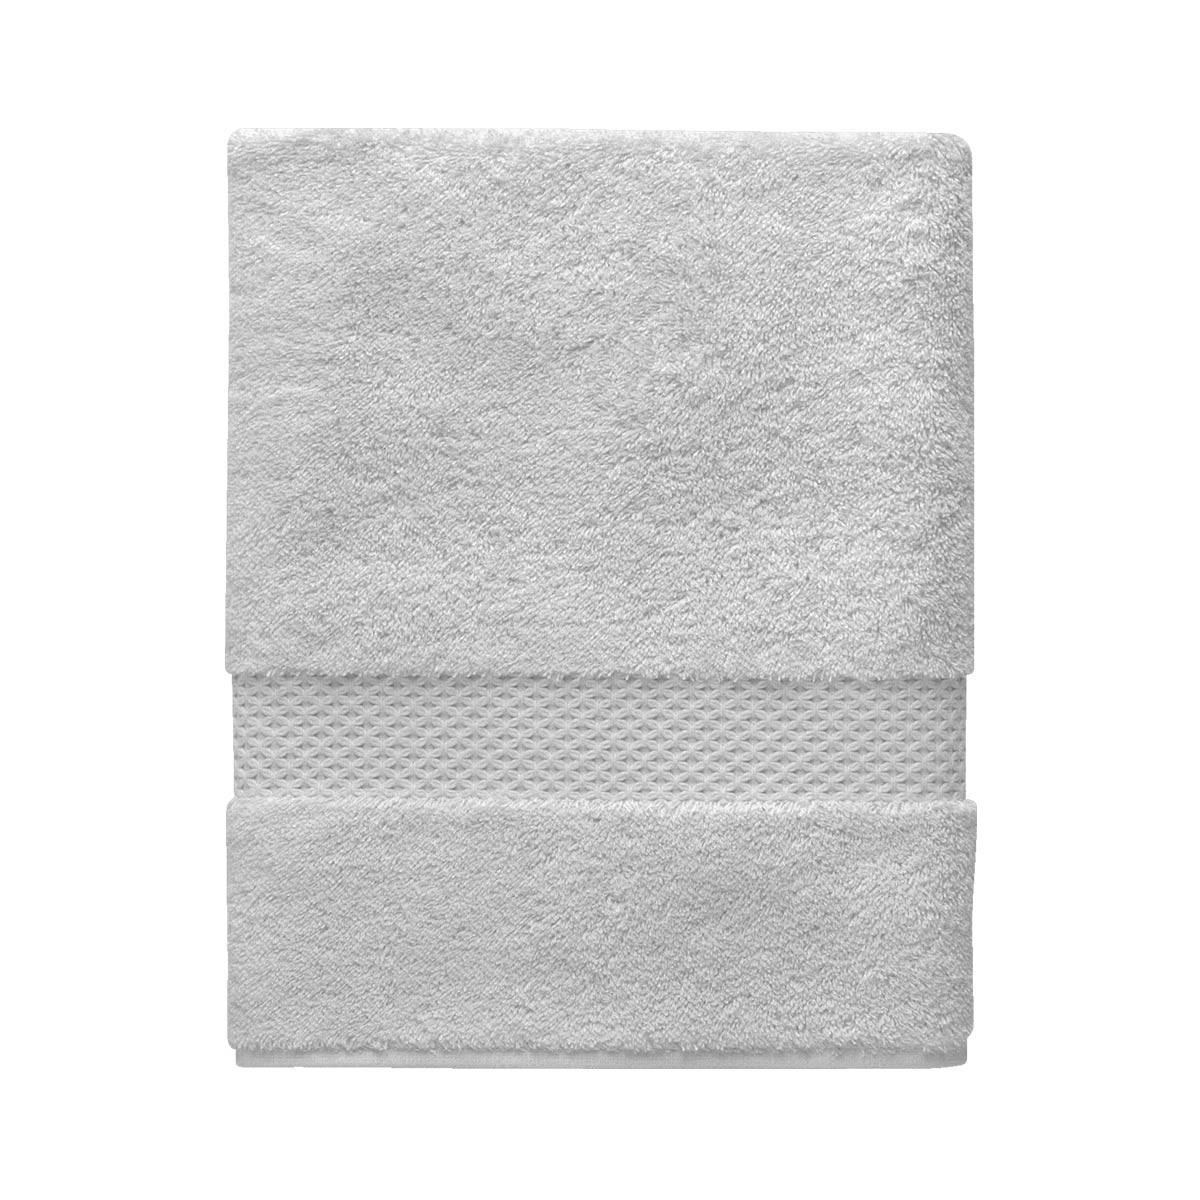 Etoile Silver Hand Towel 55x100cm